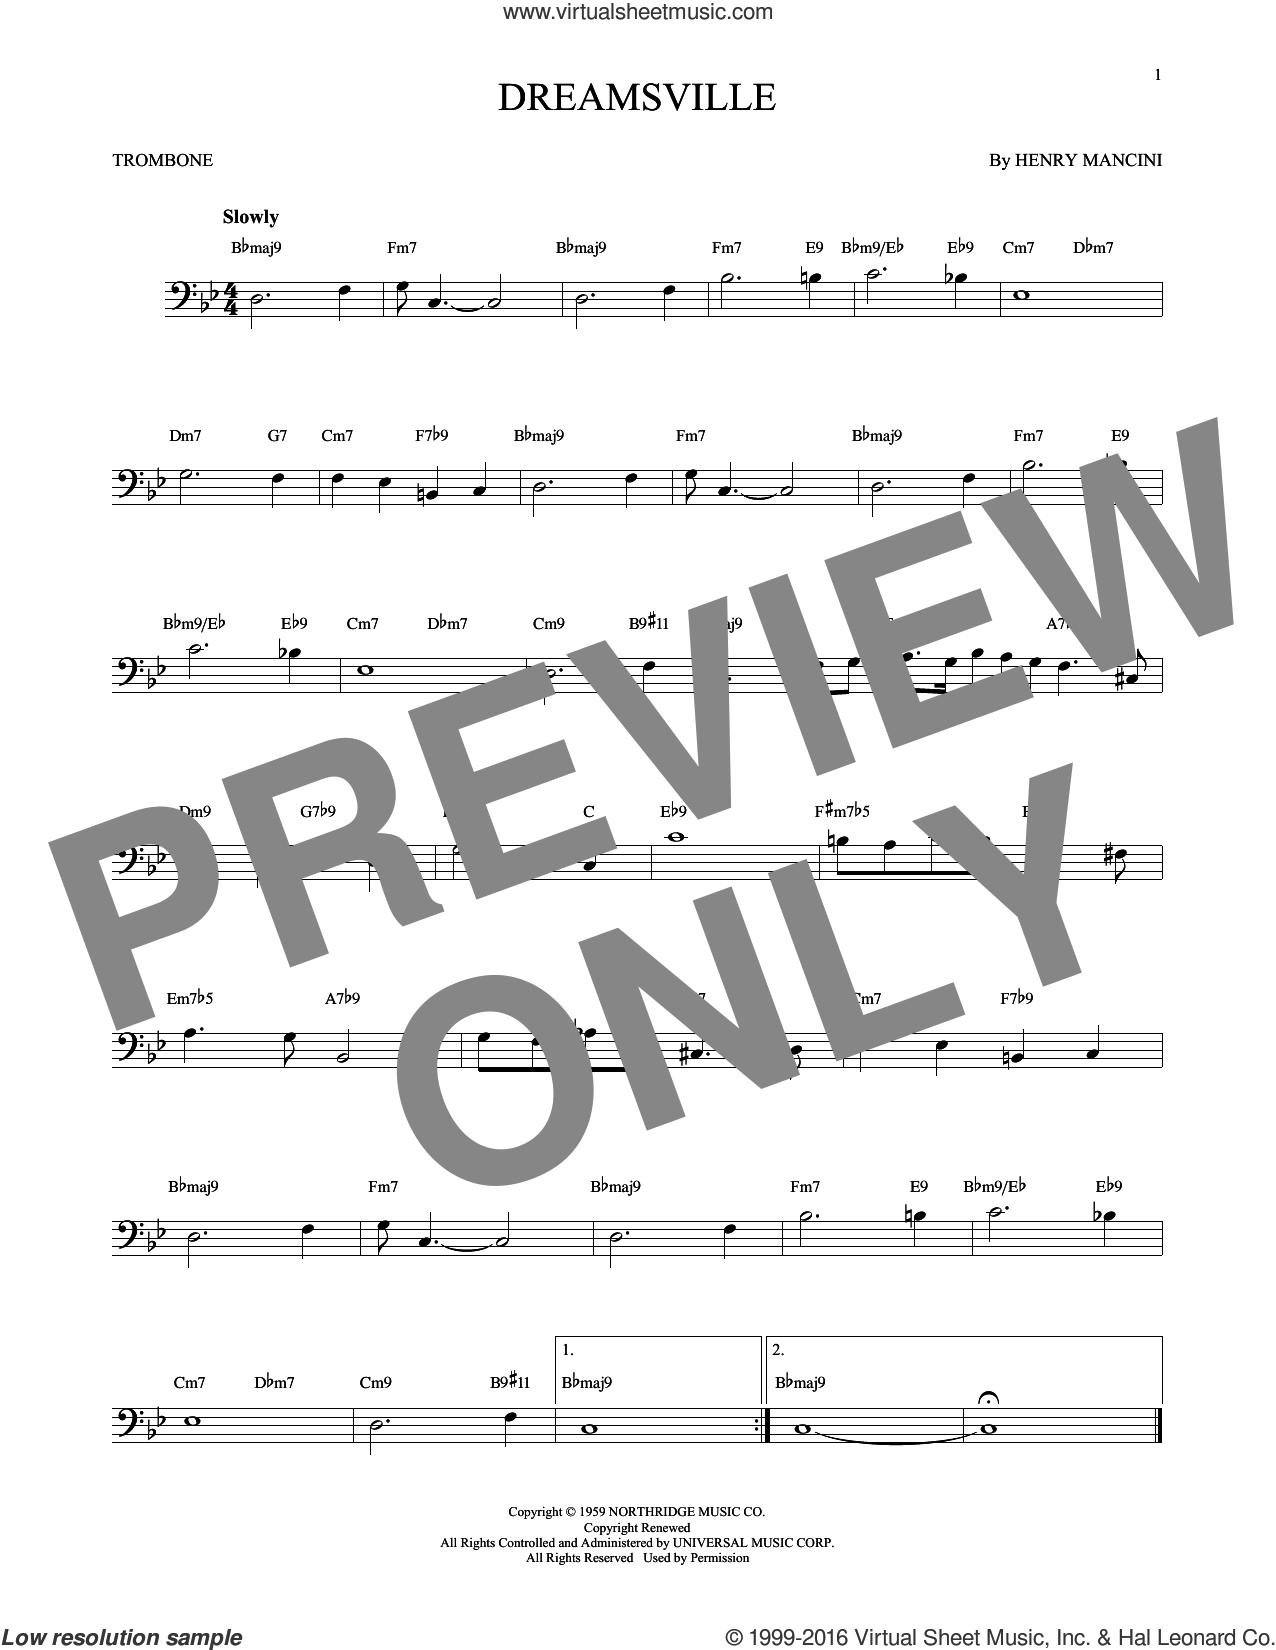 Dreamsville sheet music for trombone solo by Henry Mancini, intermediate skill level